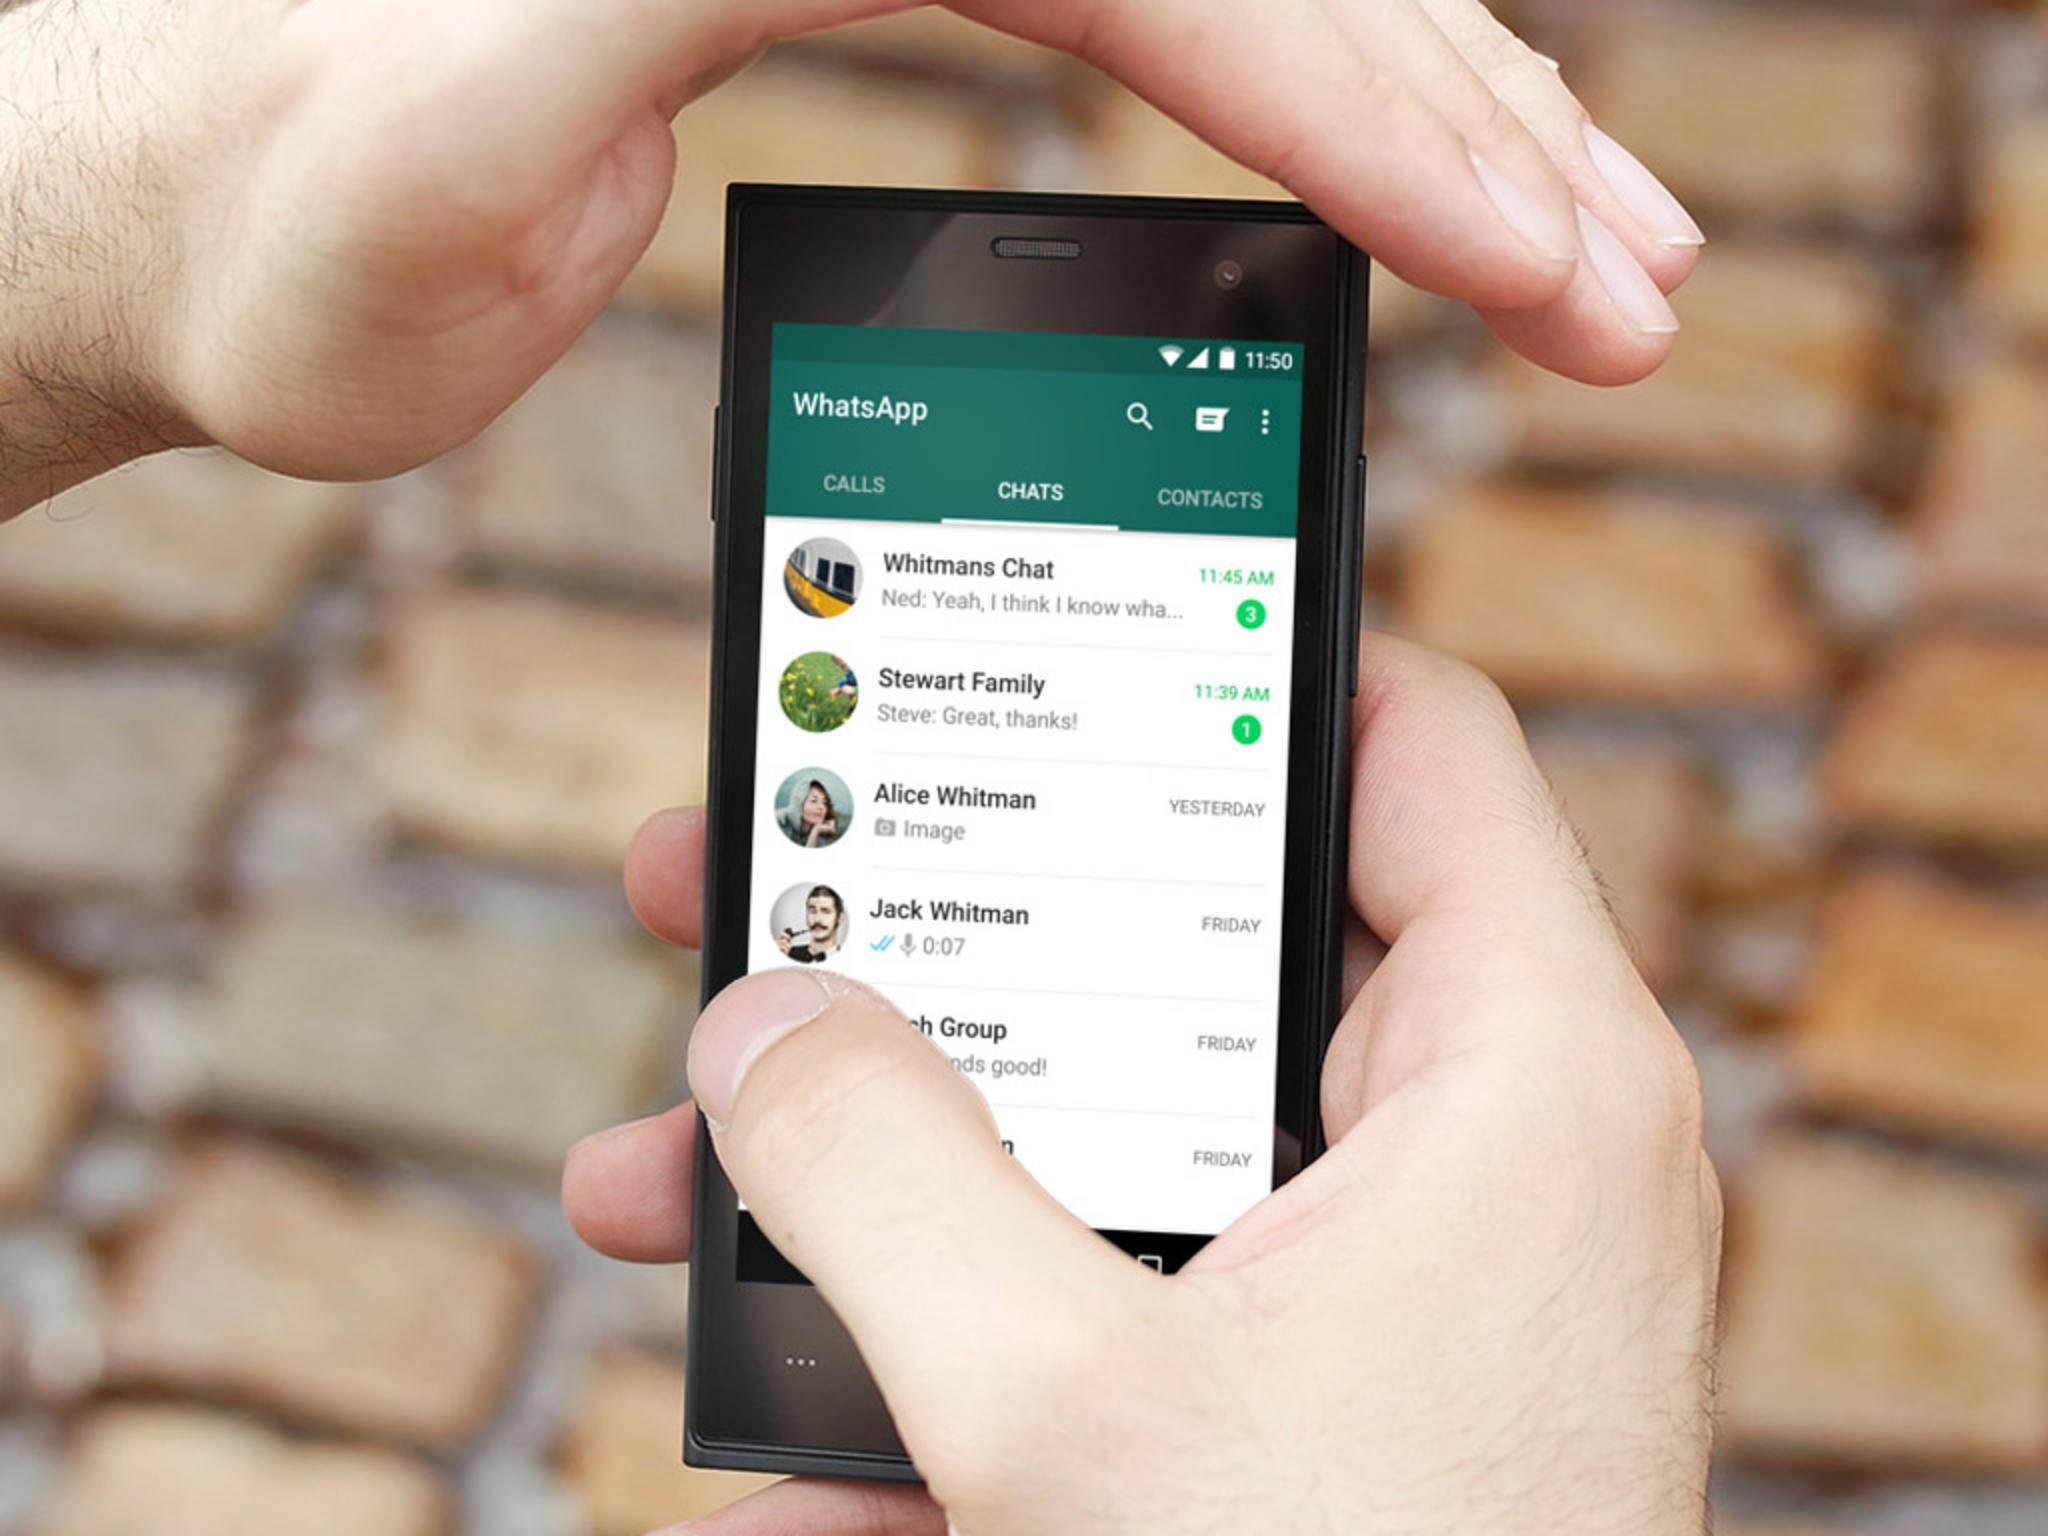 In Südafrika ist WhatsApp besonders beliebt.